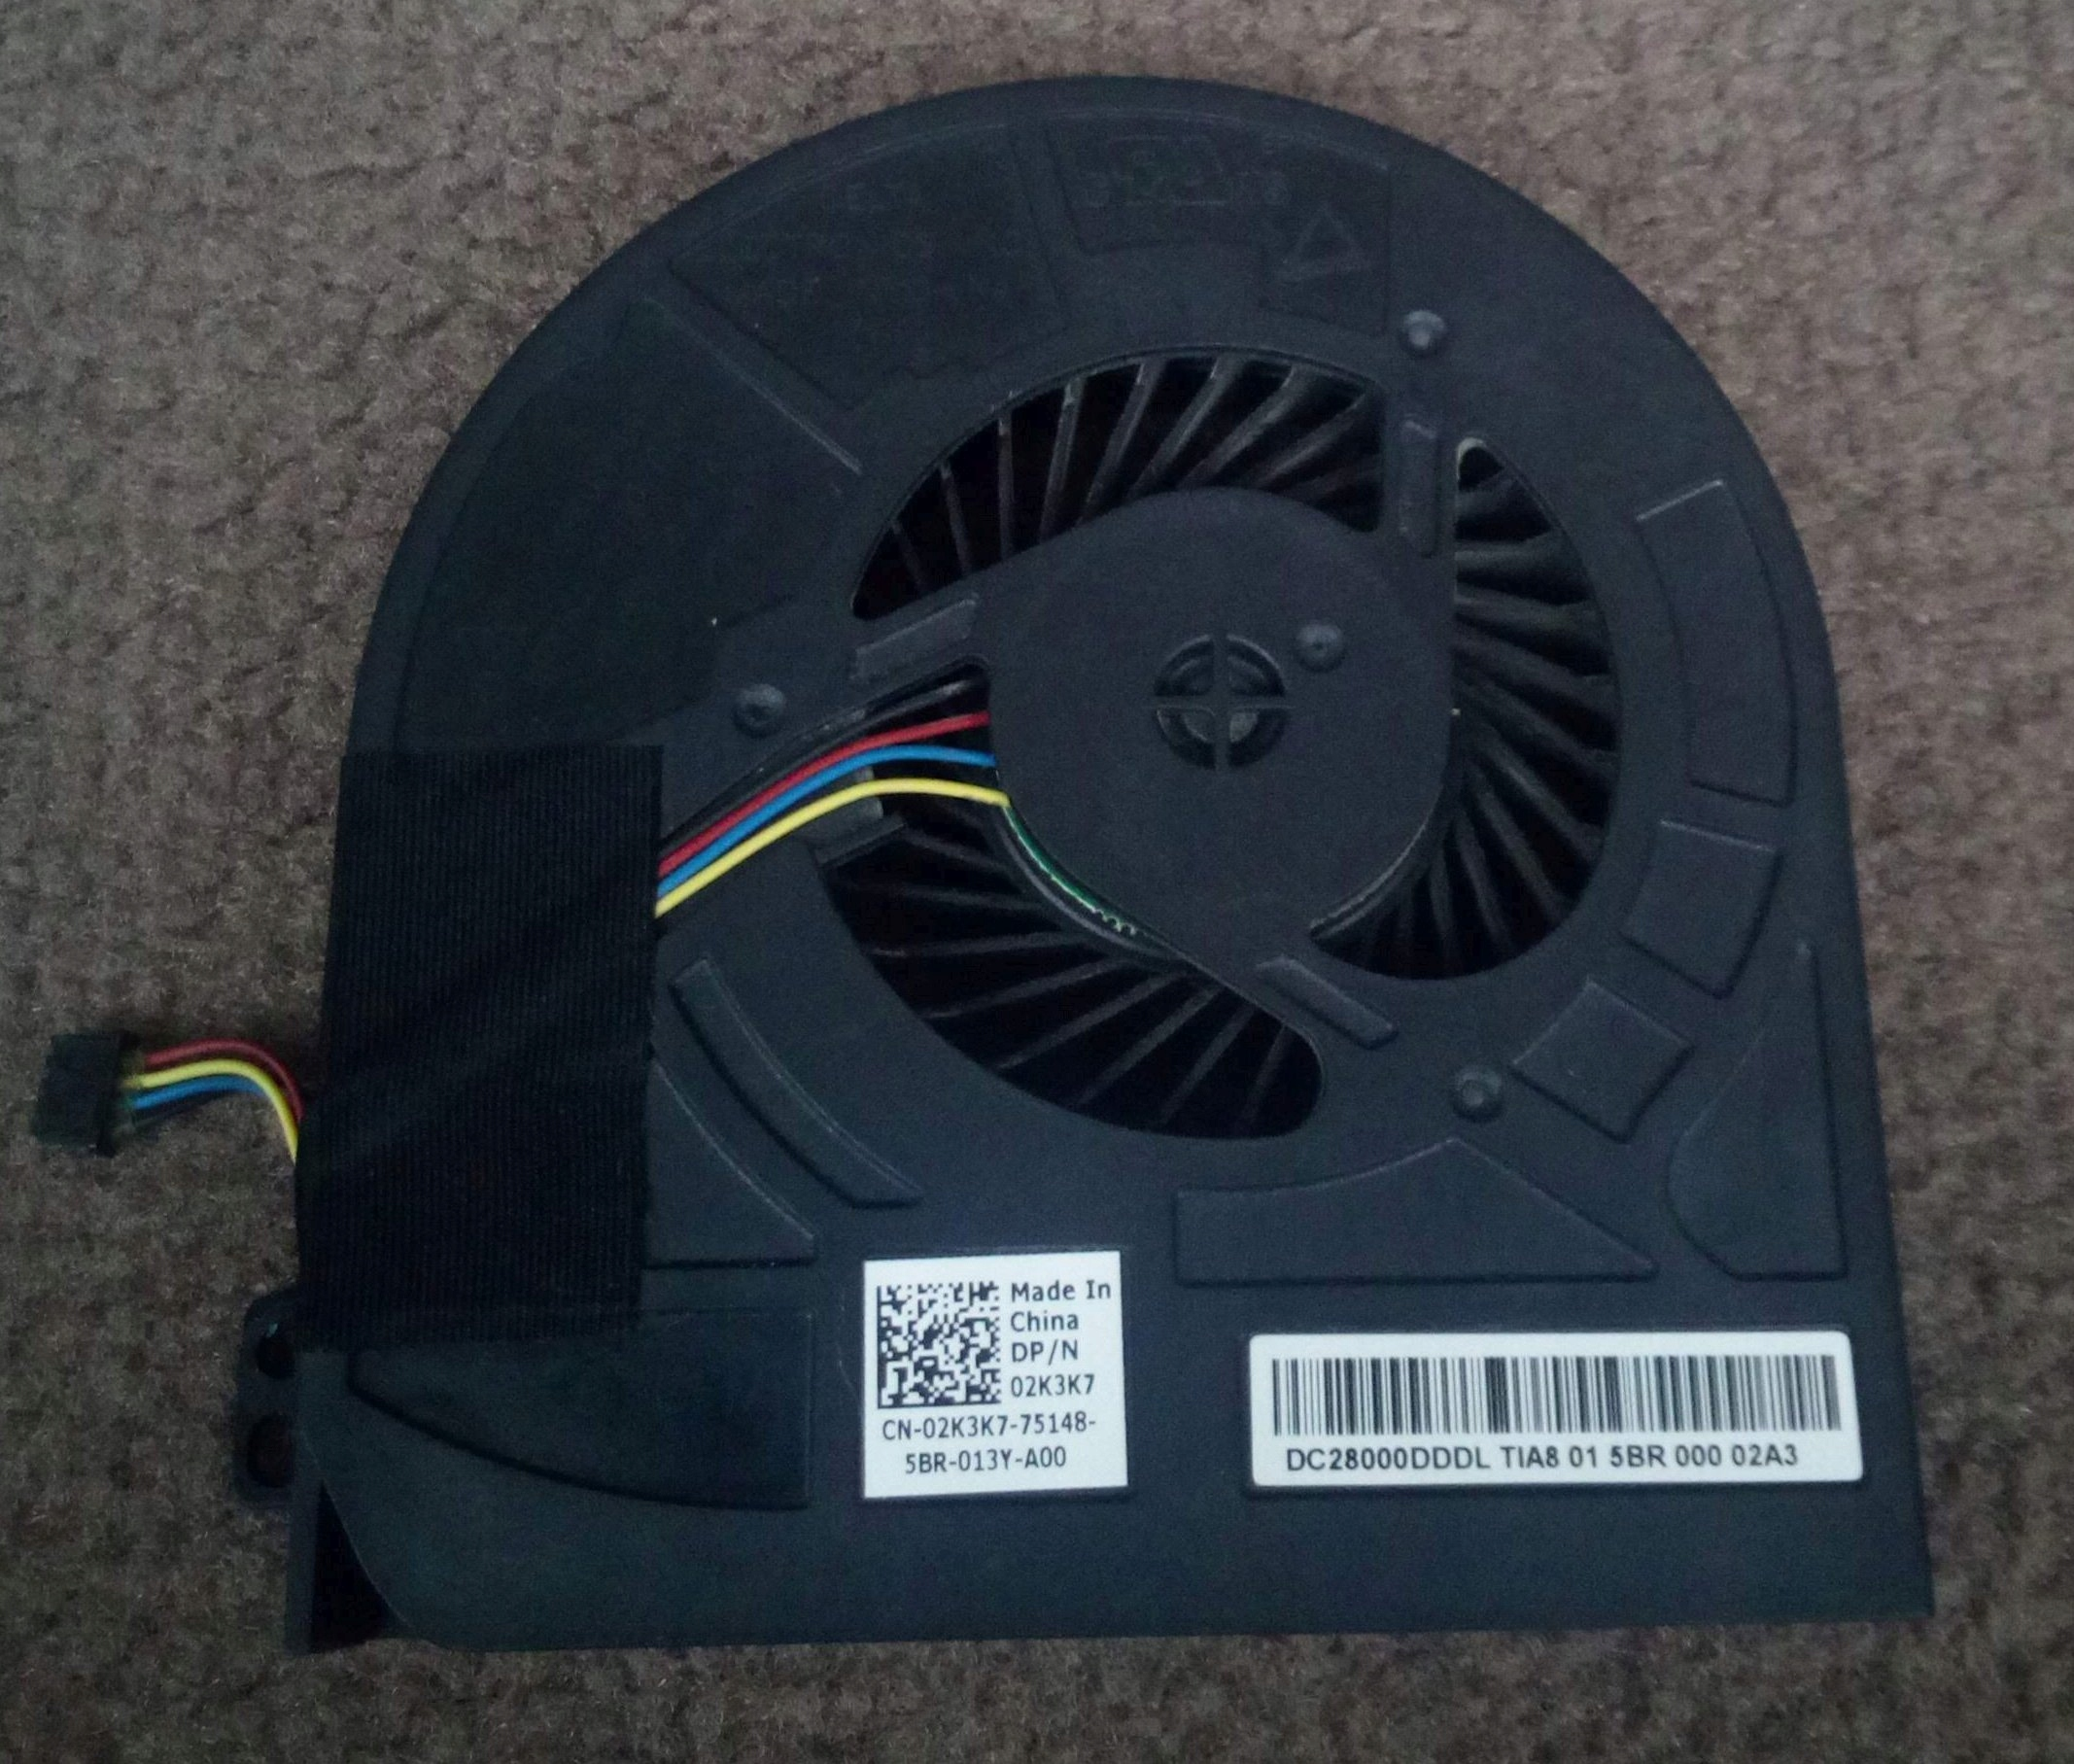 Wentylator GPU do Dell M4800 DP/N: 02K3K7 - 7785971920